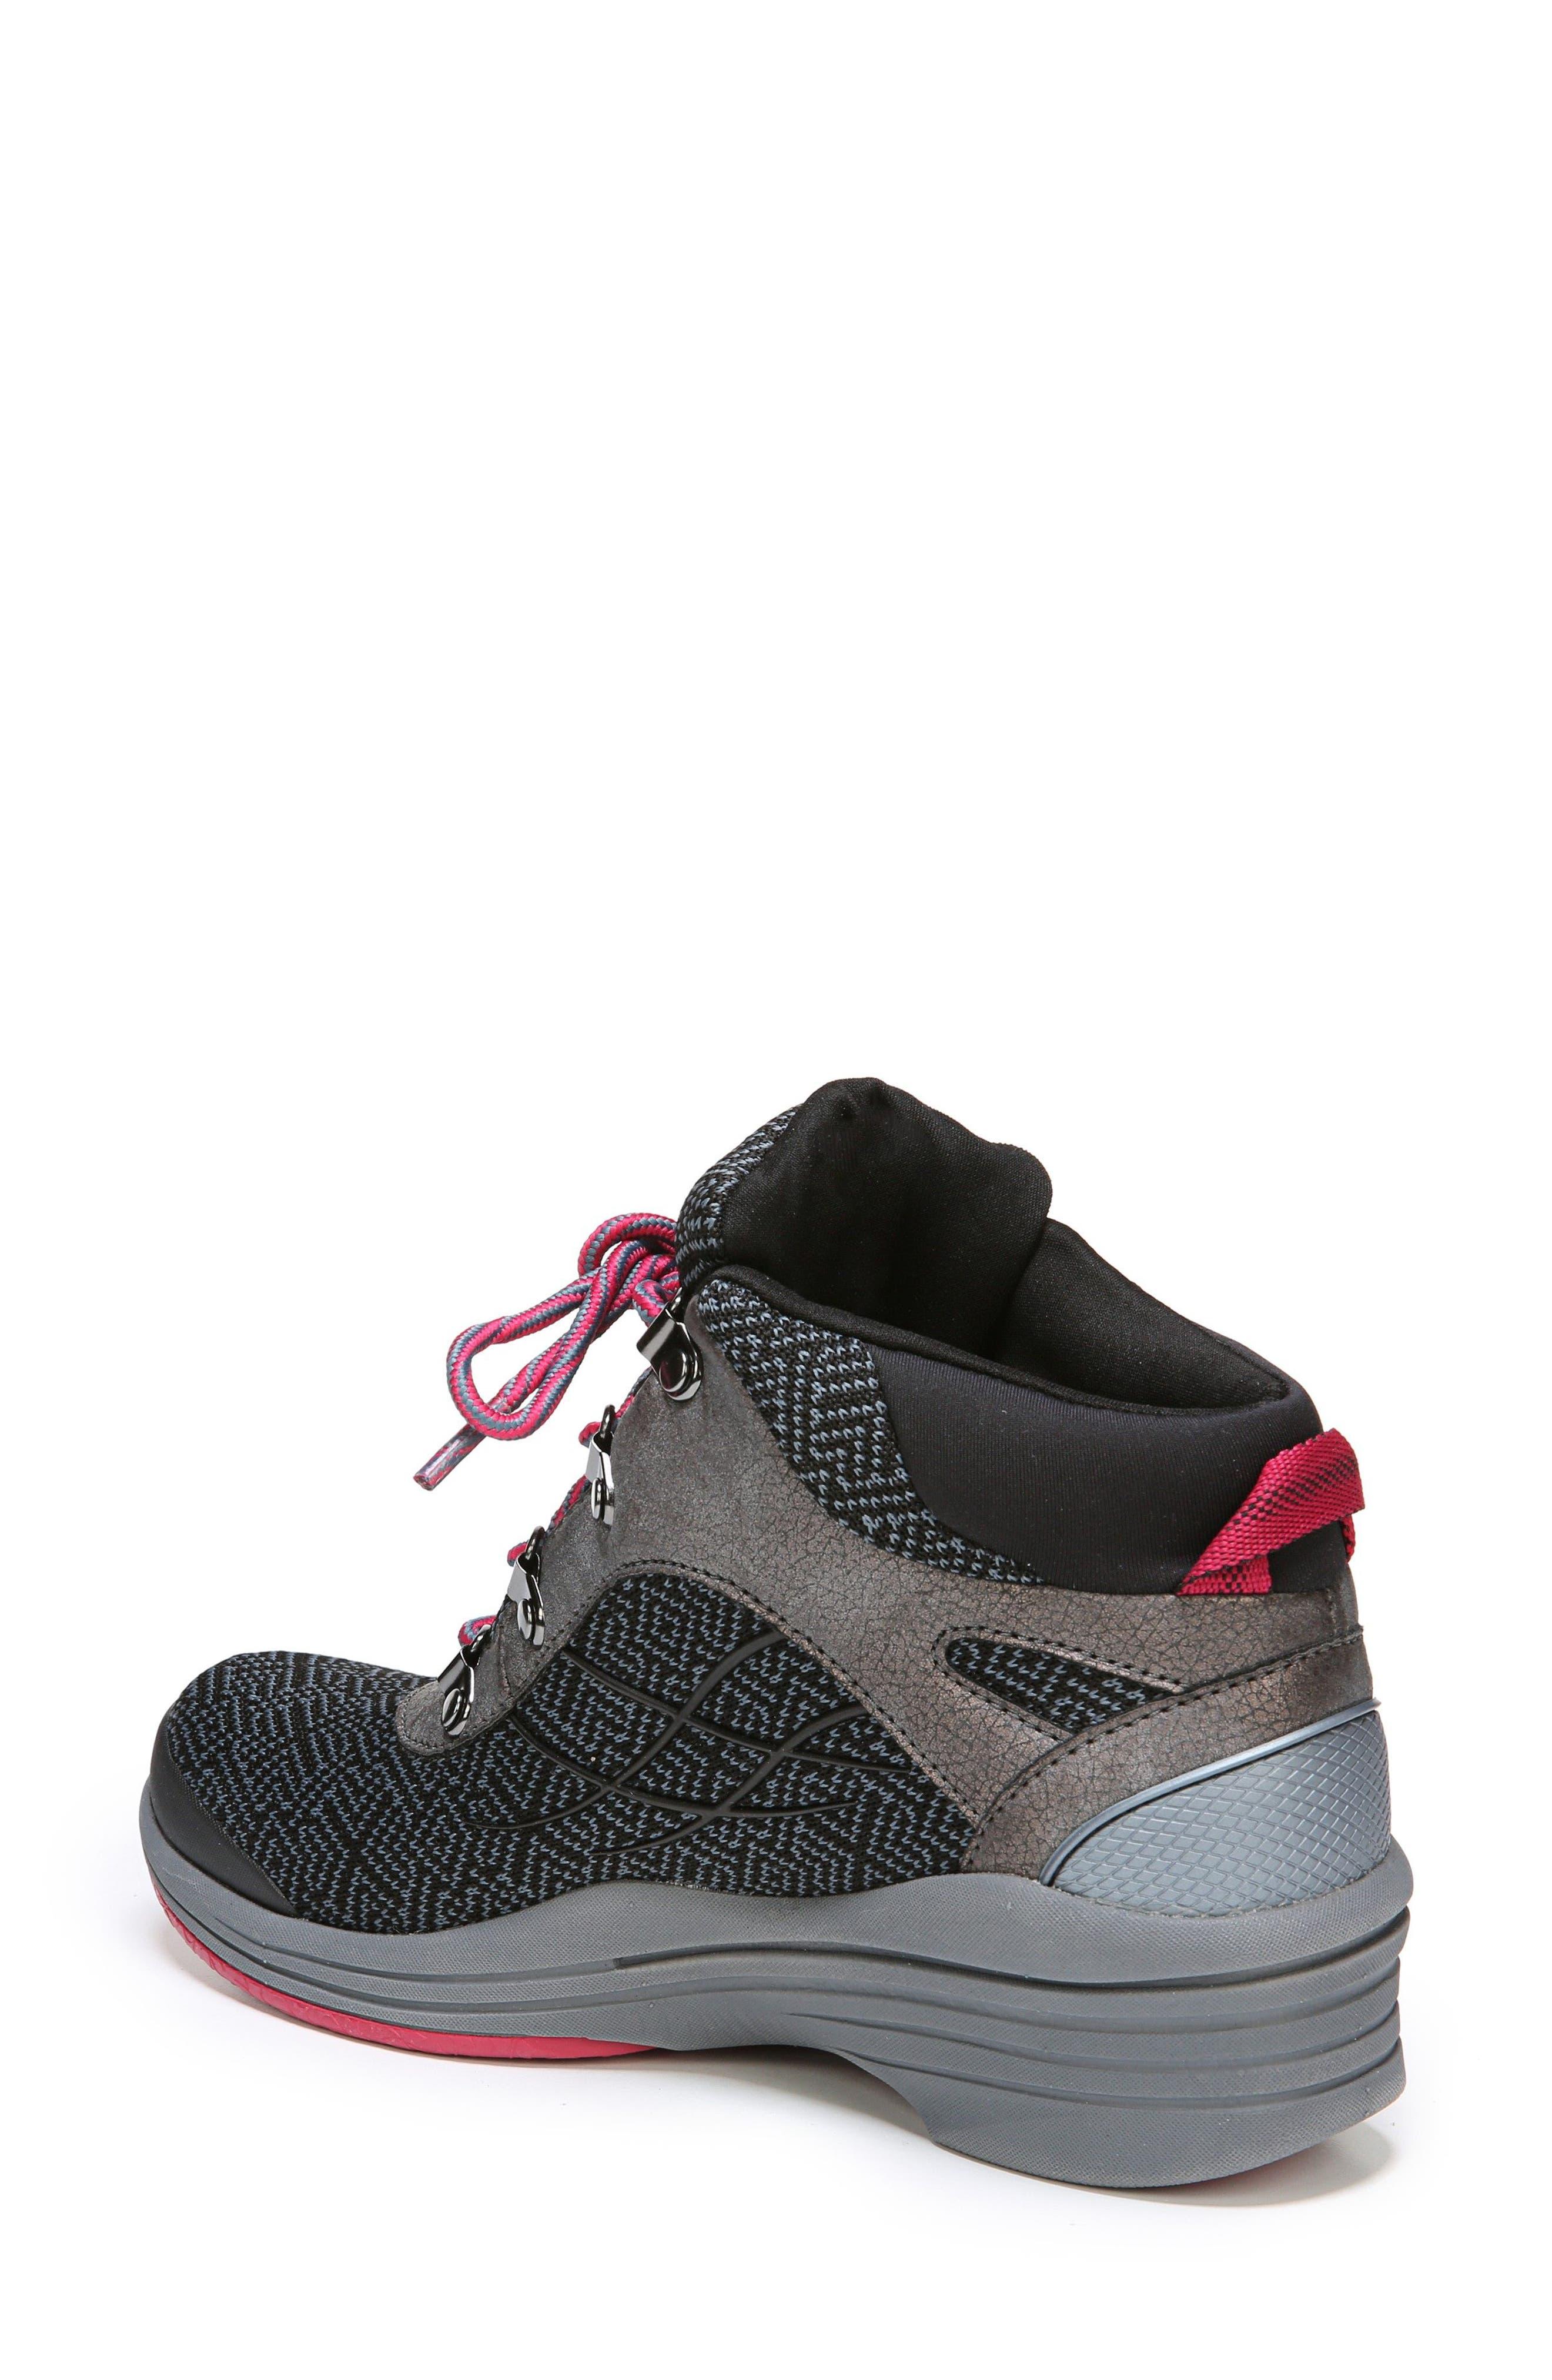 Hotshot Sneaker,                             Alternate thumbnail 4, color,